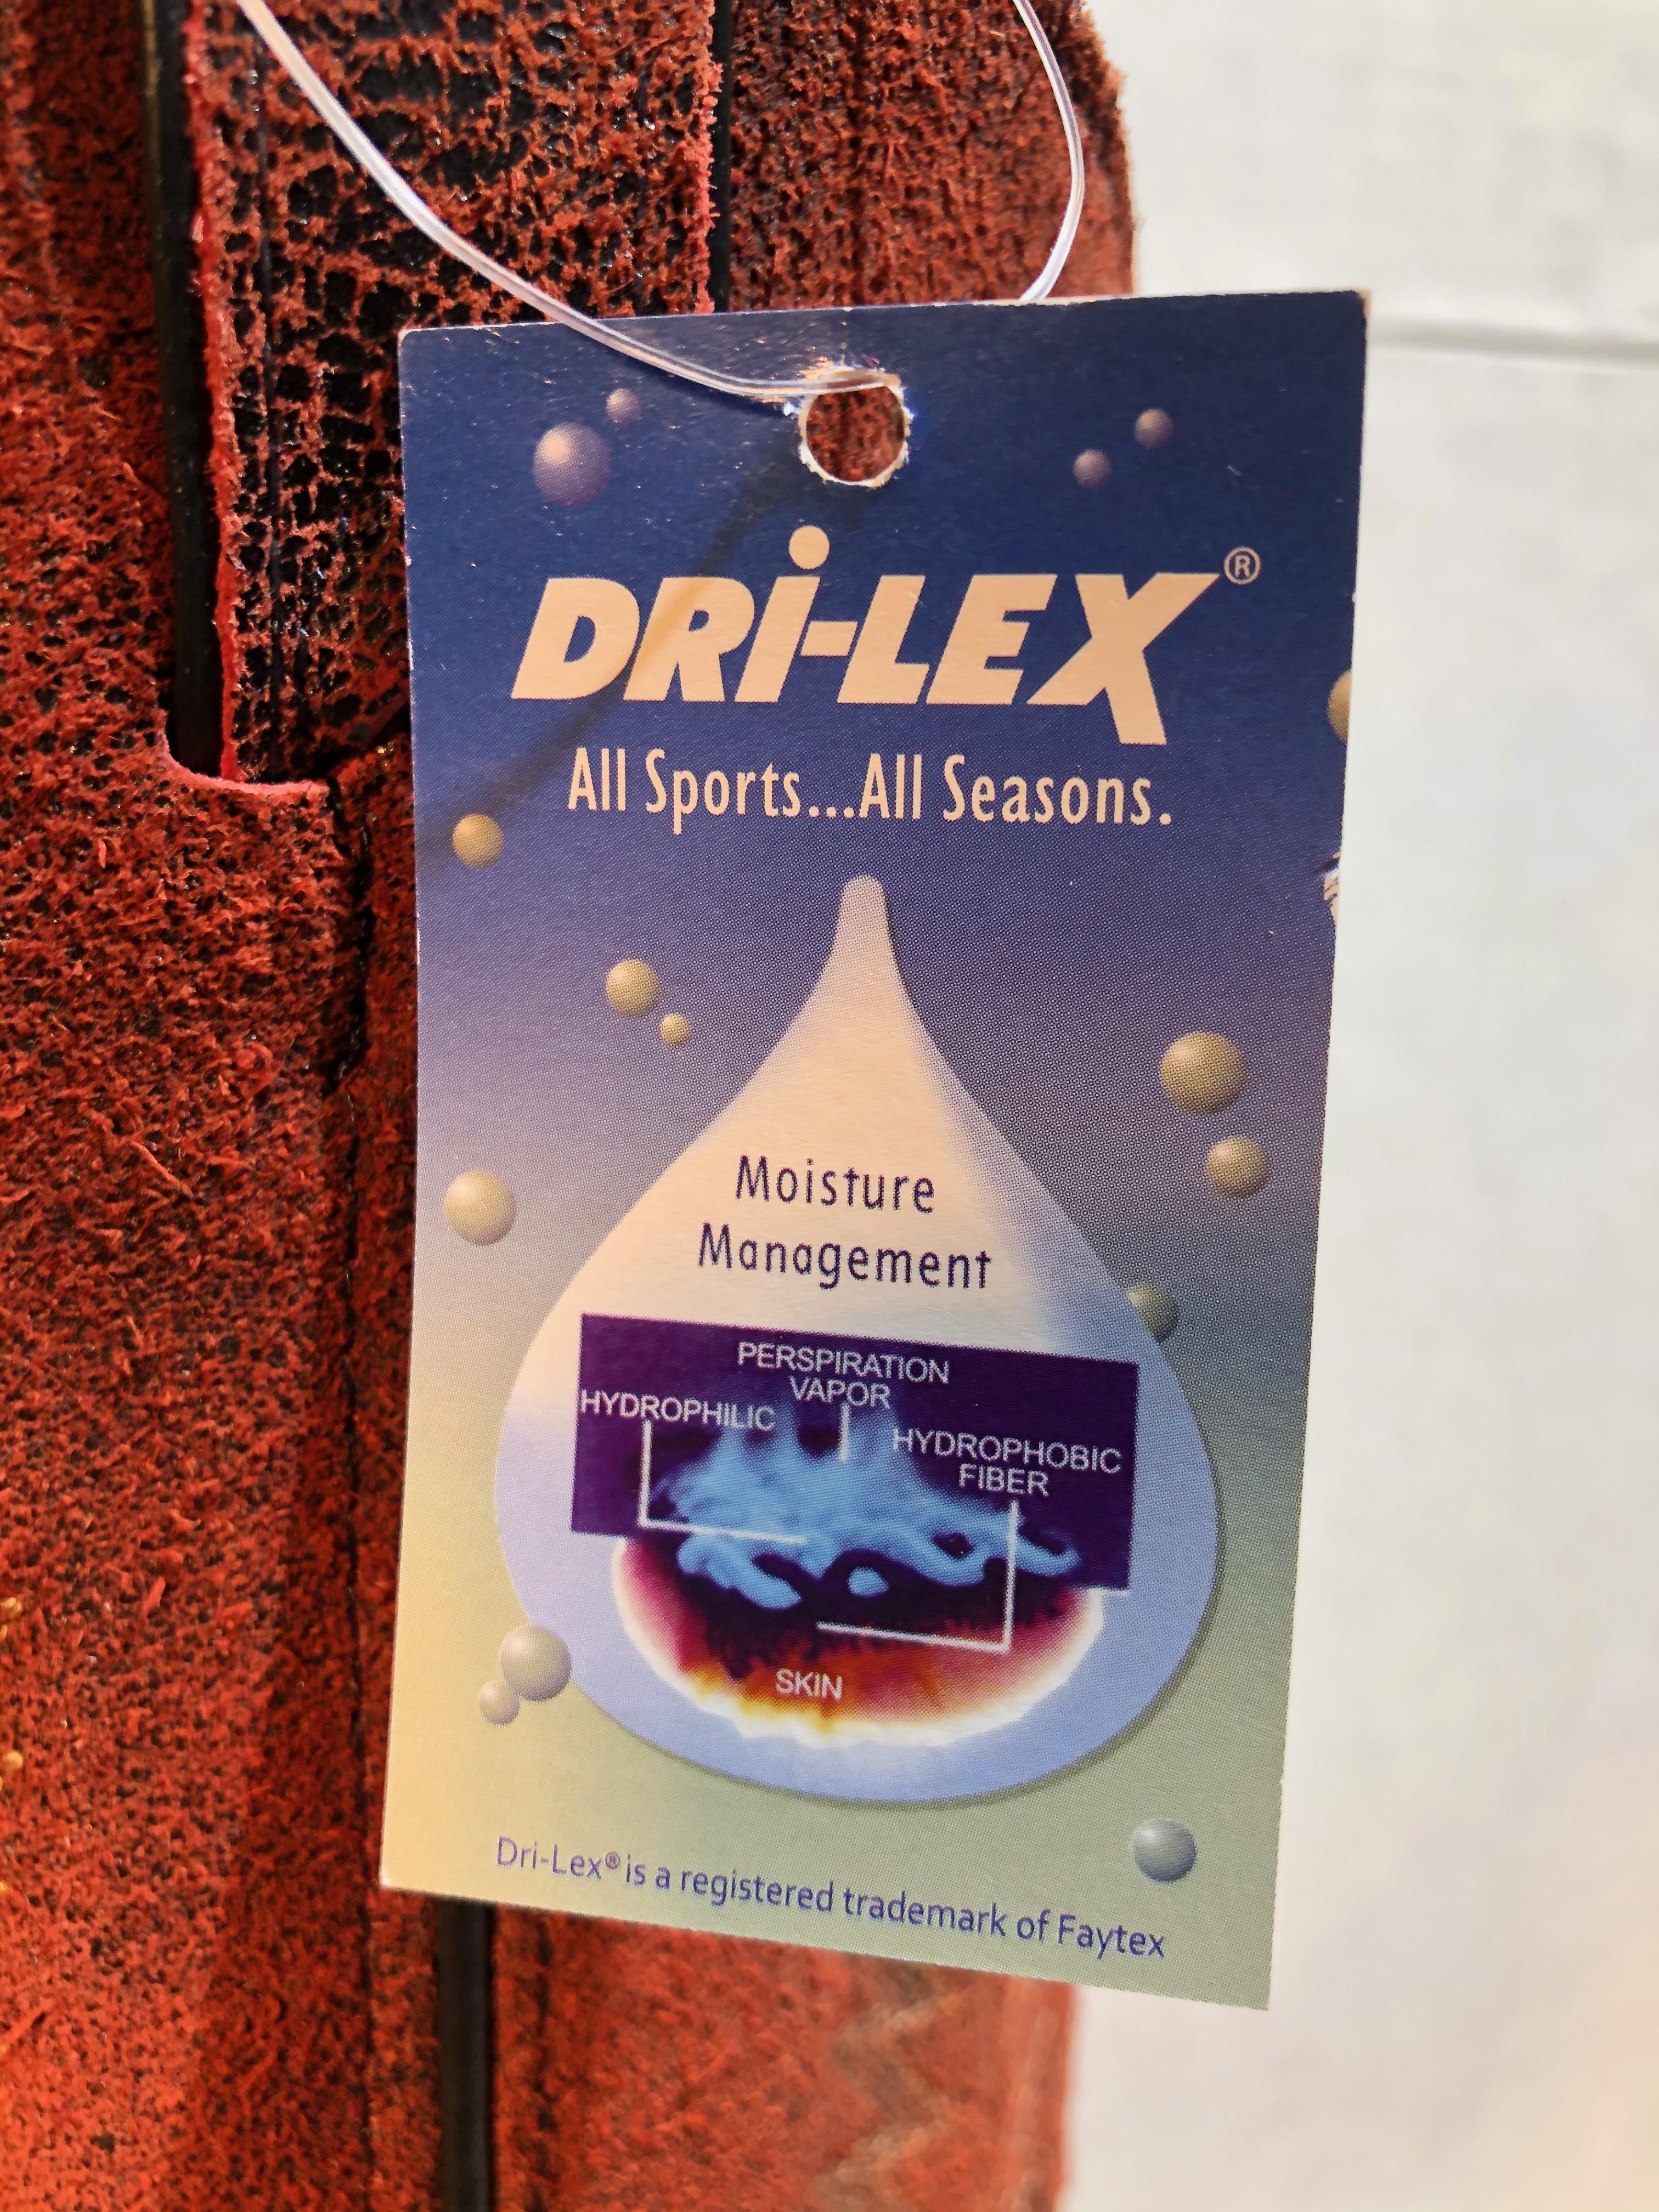 A506-DRI-LEX-front-label